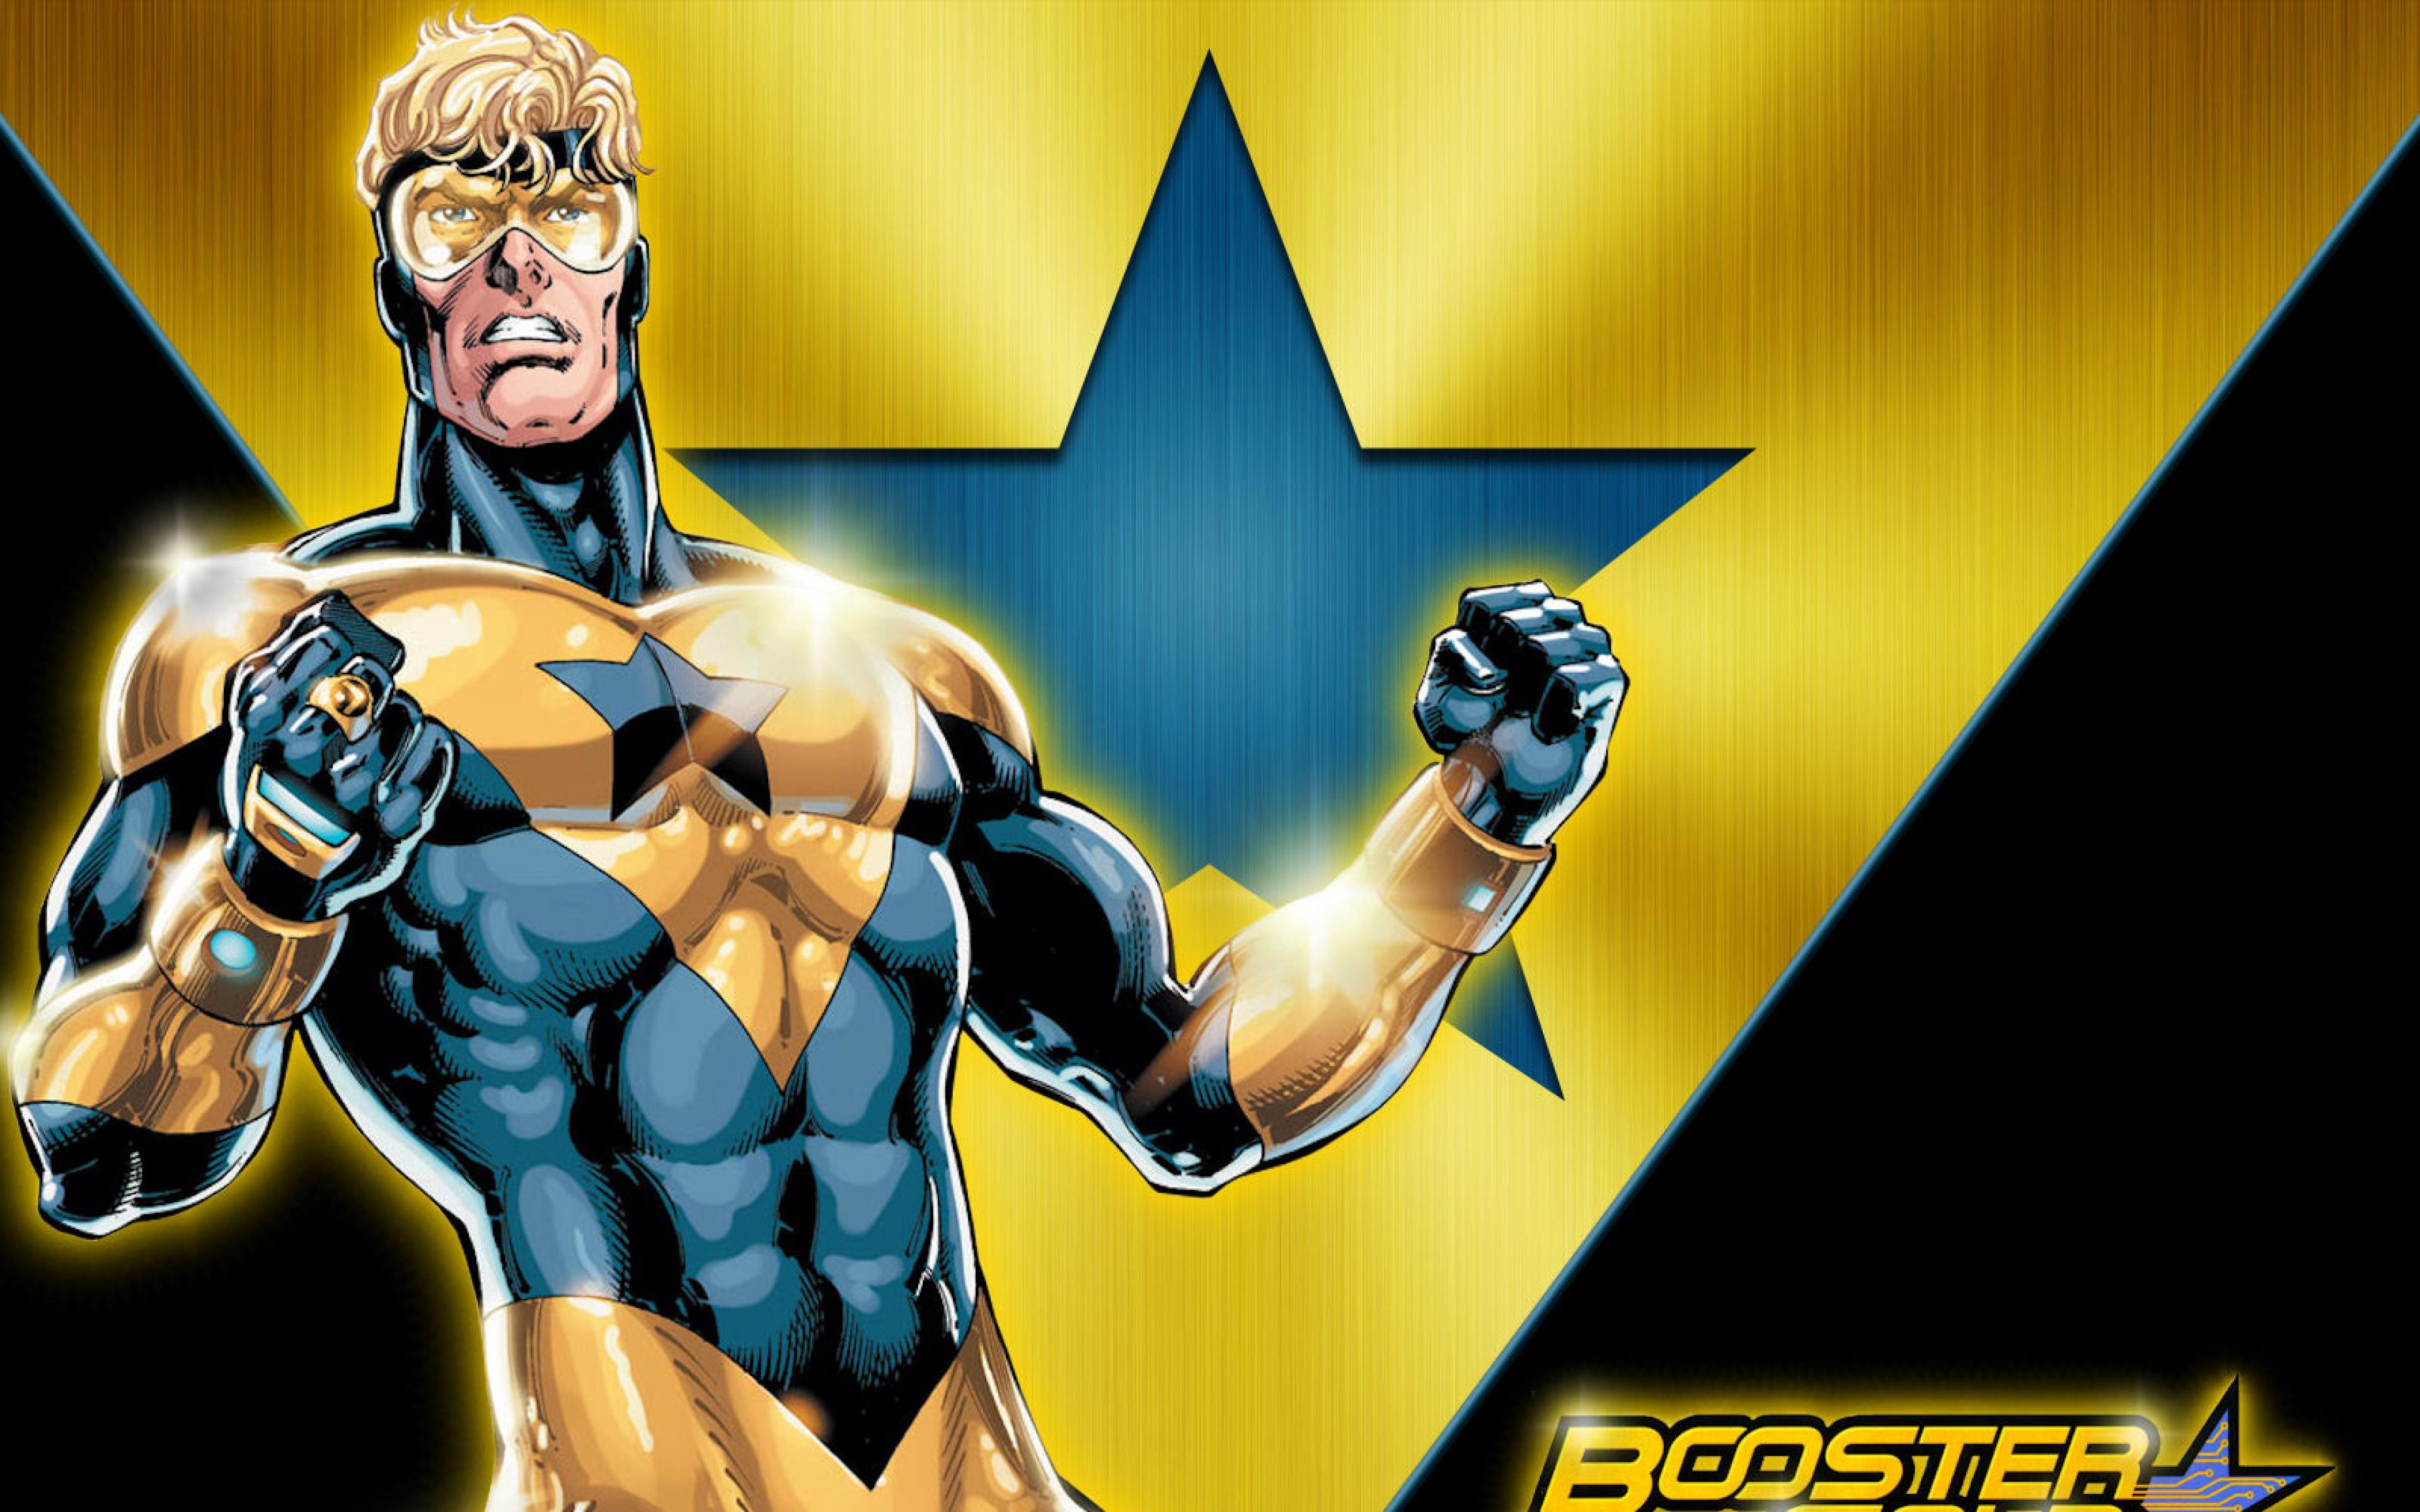 Booster gold Dc comics Superhero Wallpaper Background Ultra HD 4K 3840x2400